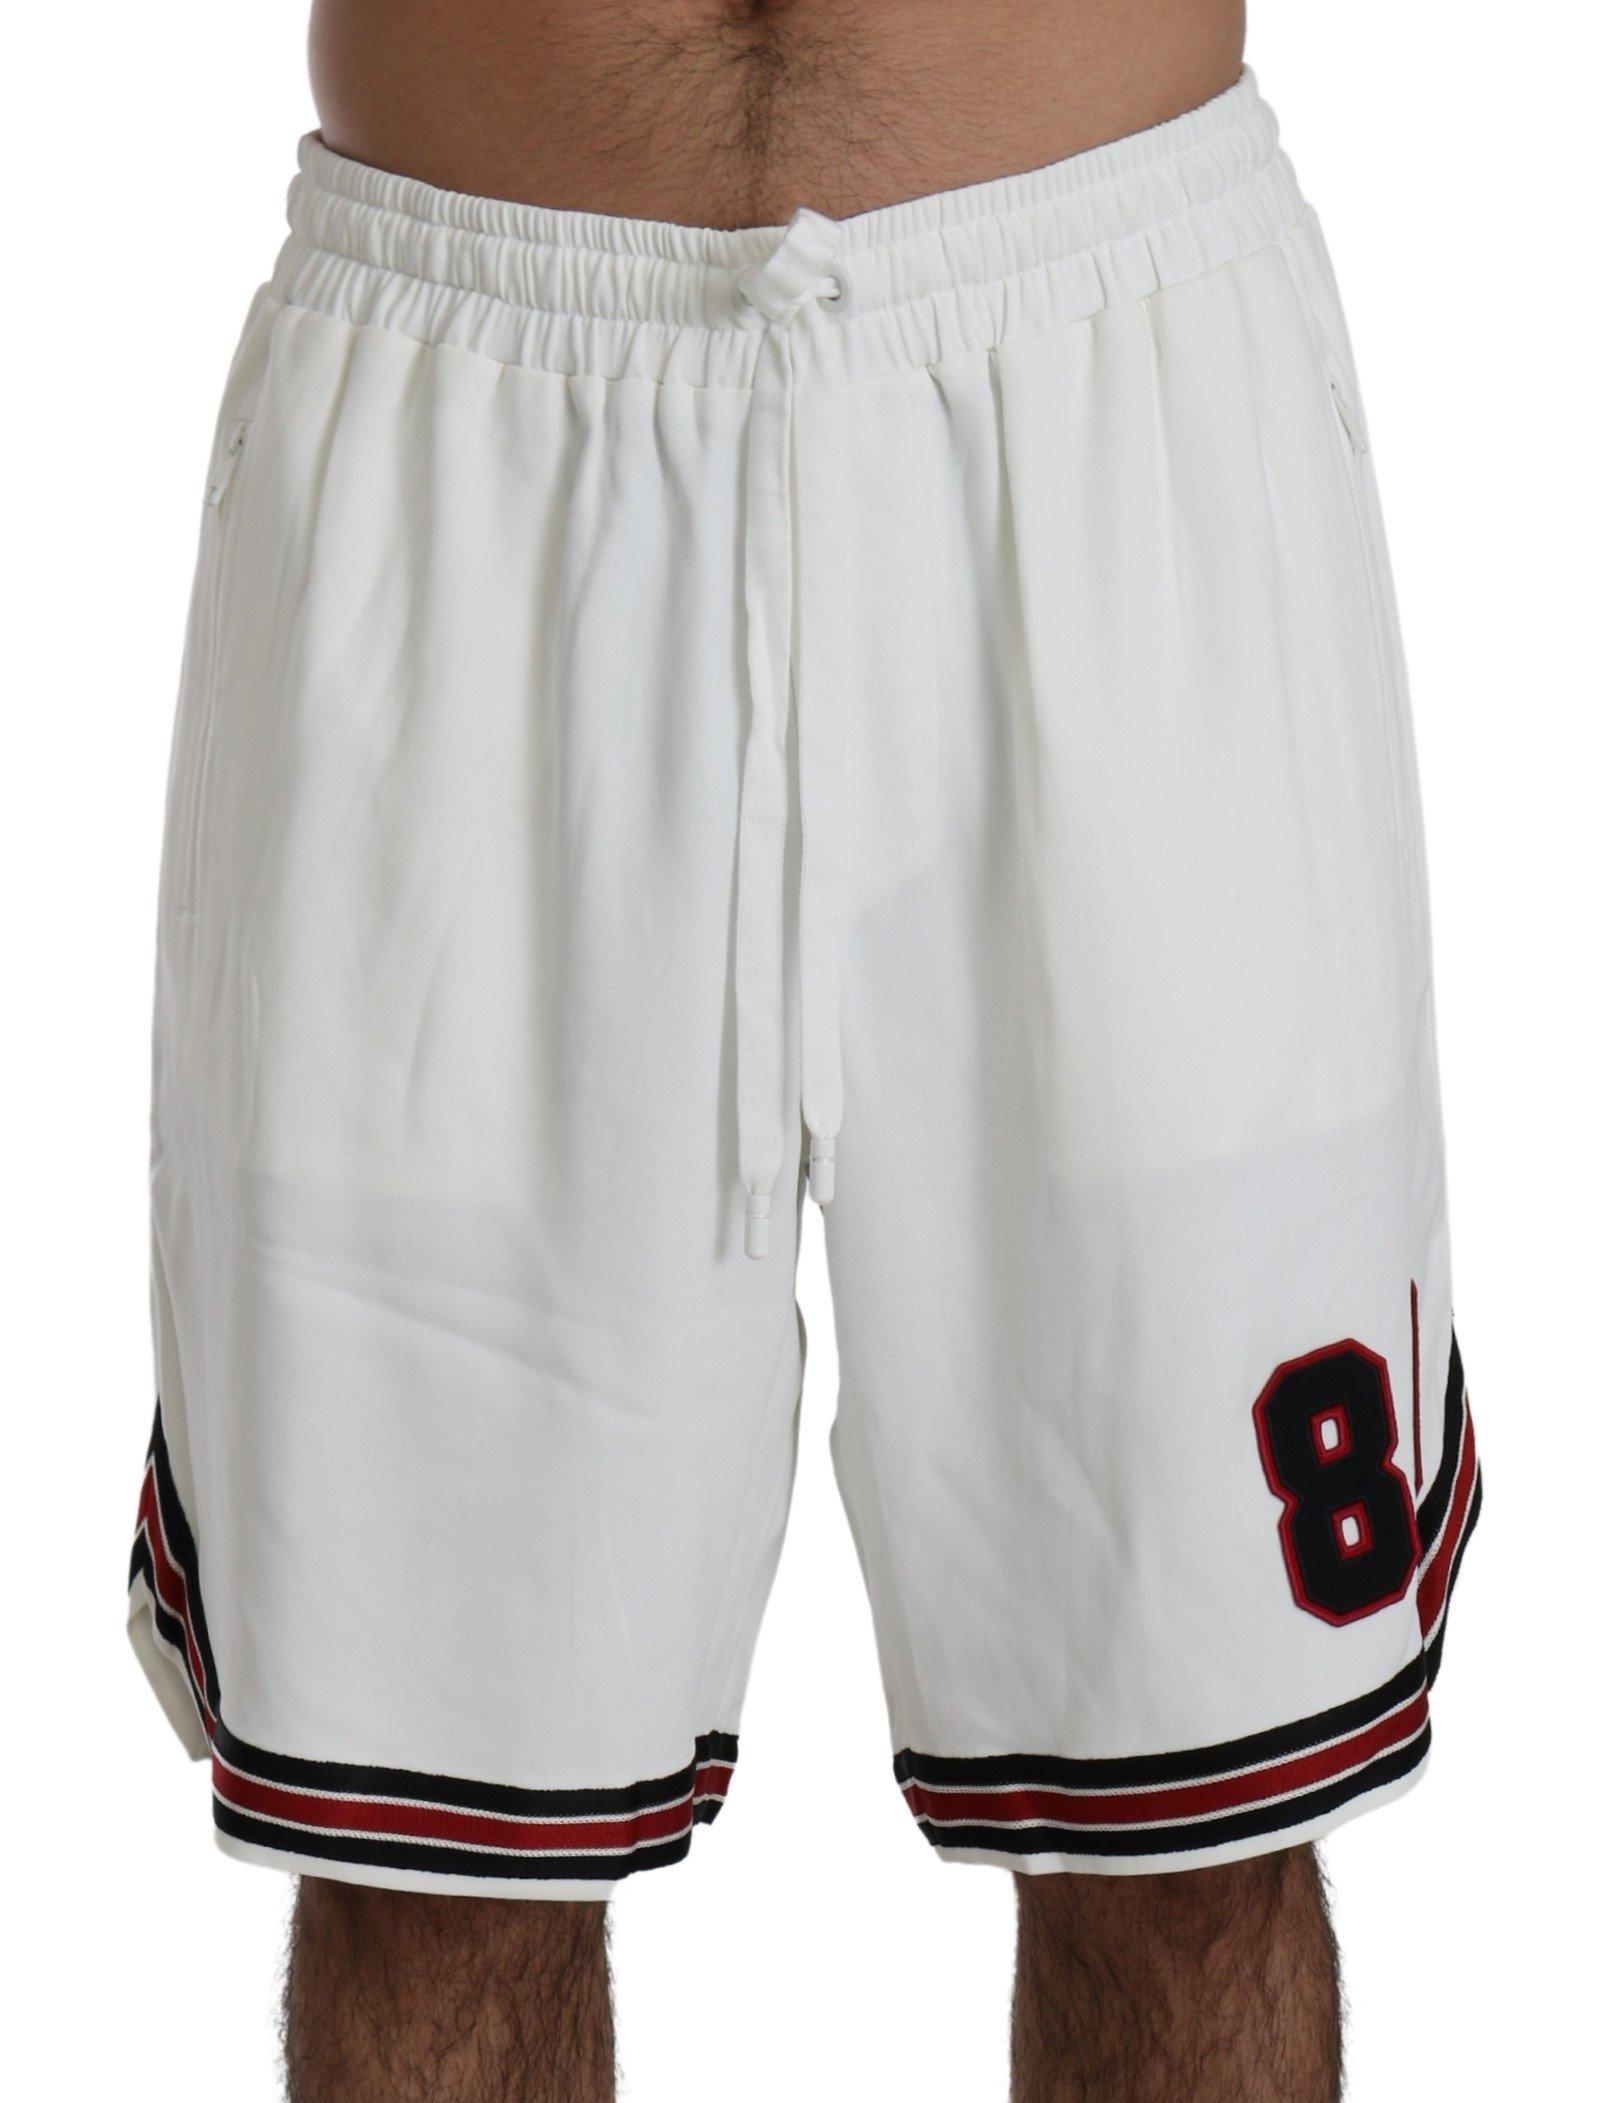 Dolce & Gabbana Men's Jersey Casual Sport Short White PAN71431 - IT52 | L